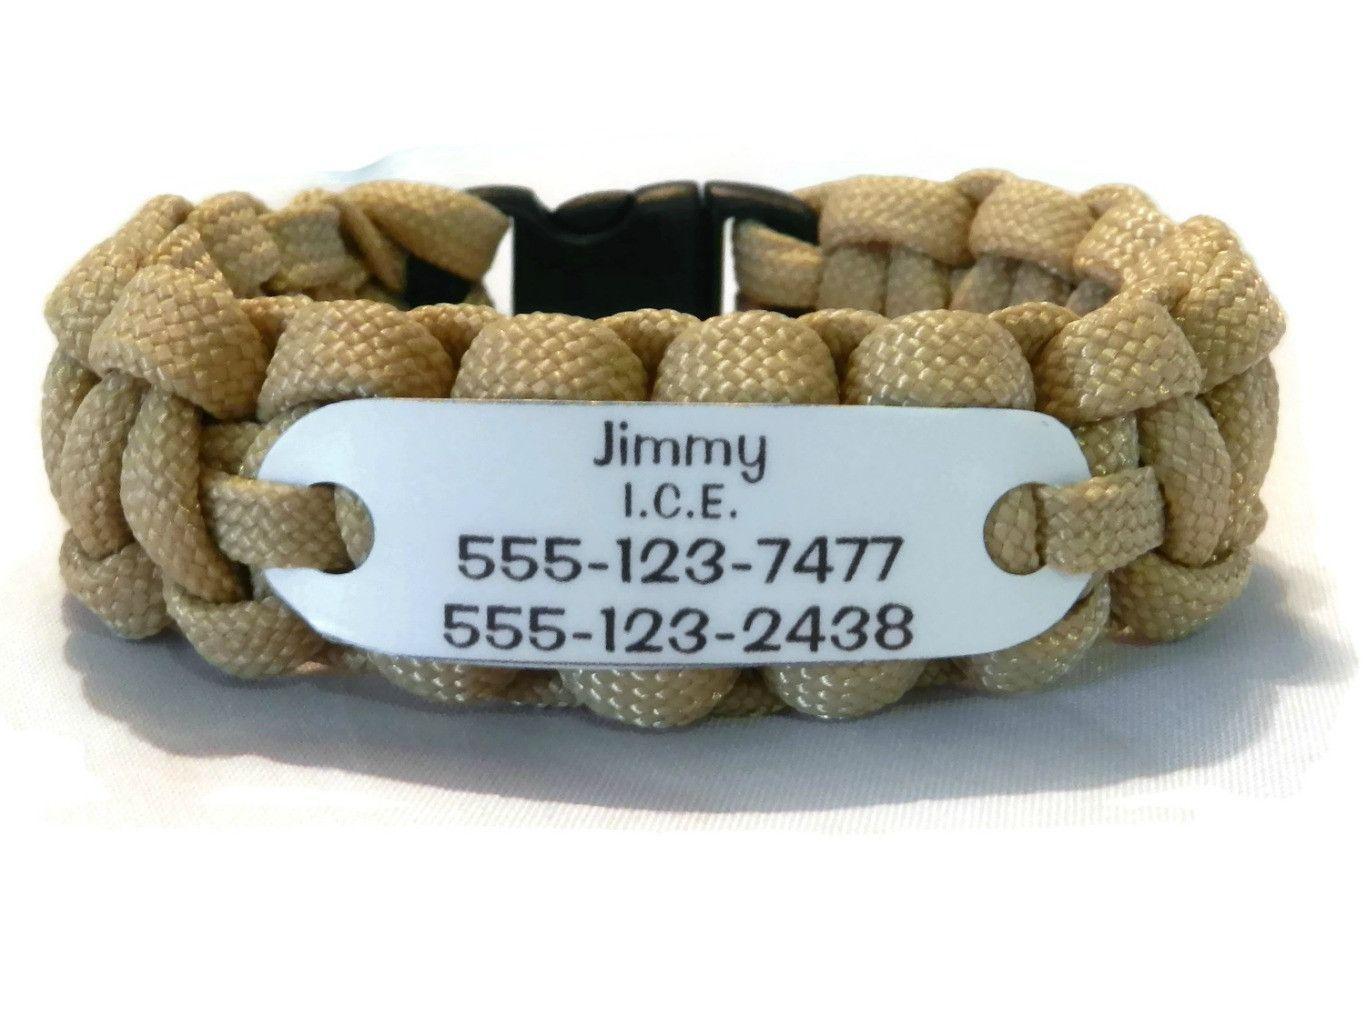 I C E Bracelet Name With 2 Phone Numbers Wristband Lost Kids Id Dementia